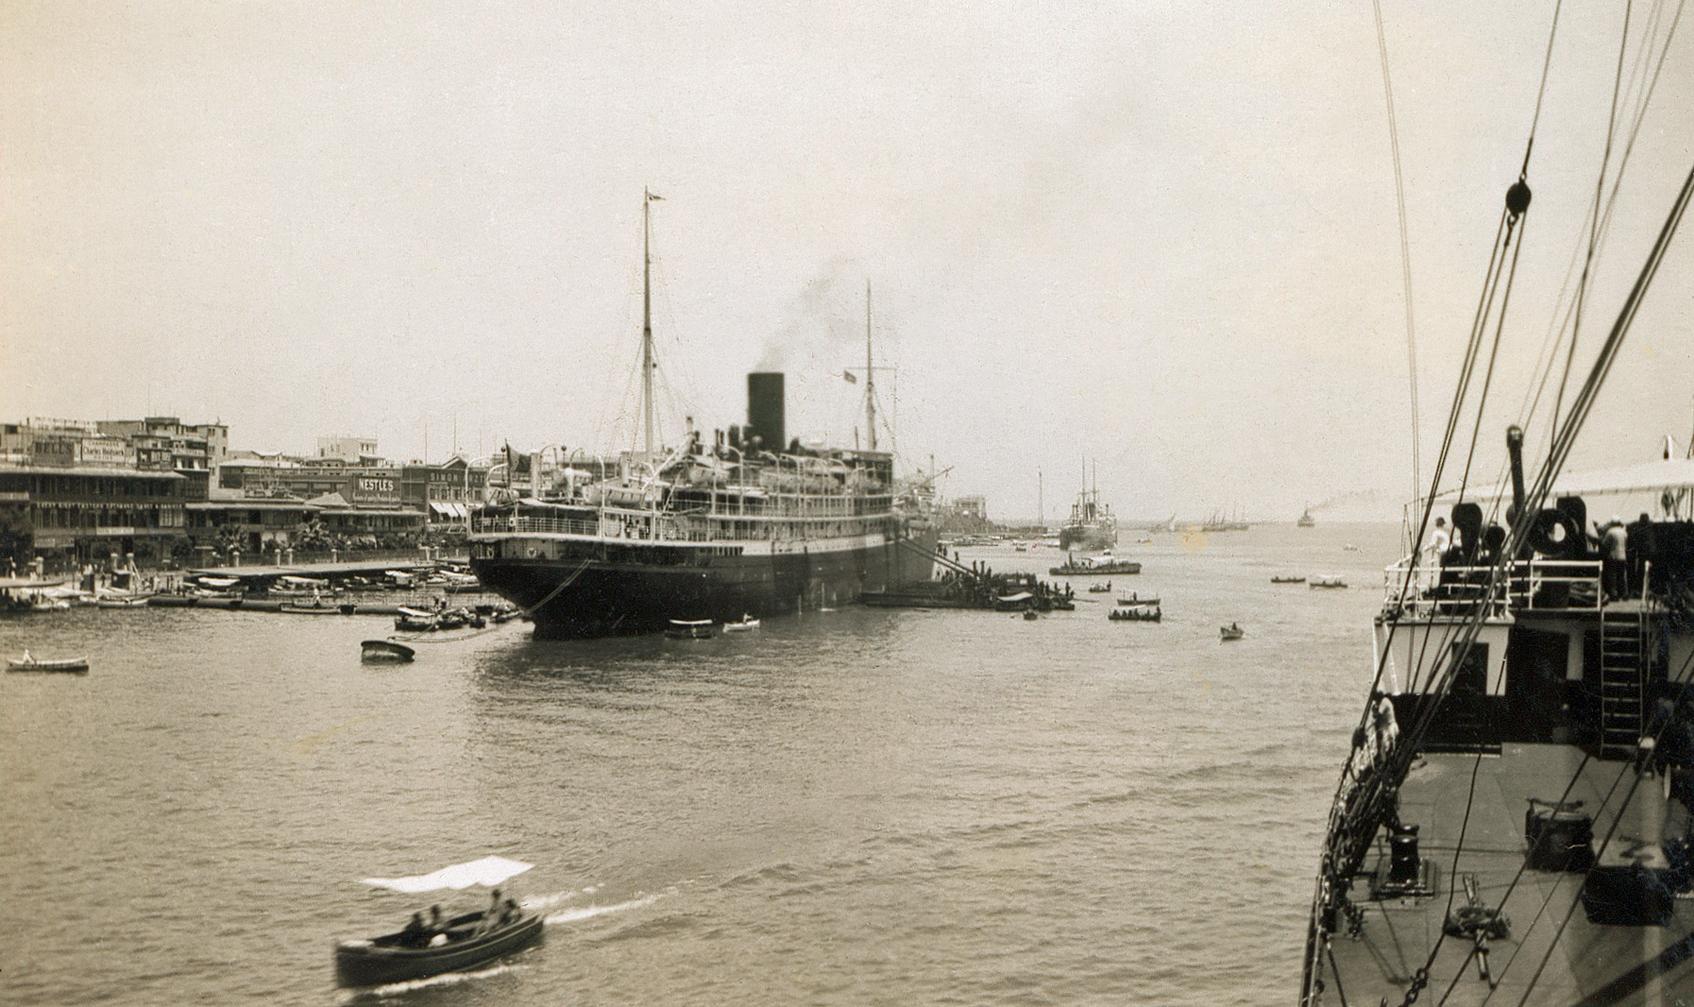 Port_Said_1930s_02.jpg